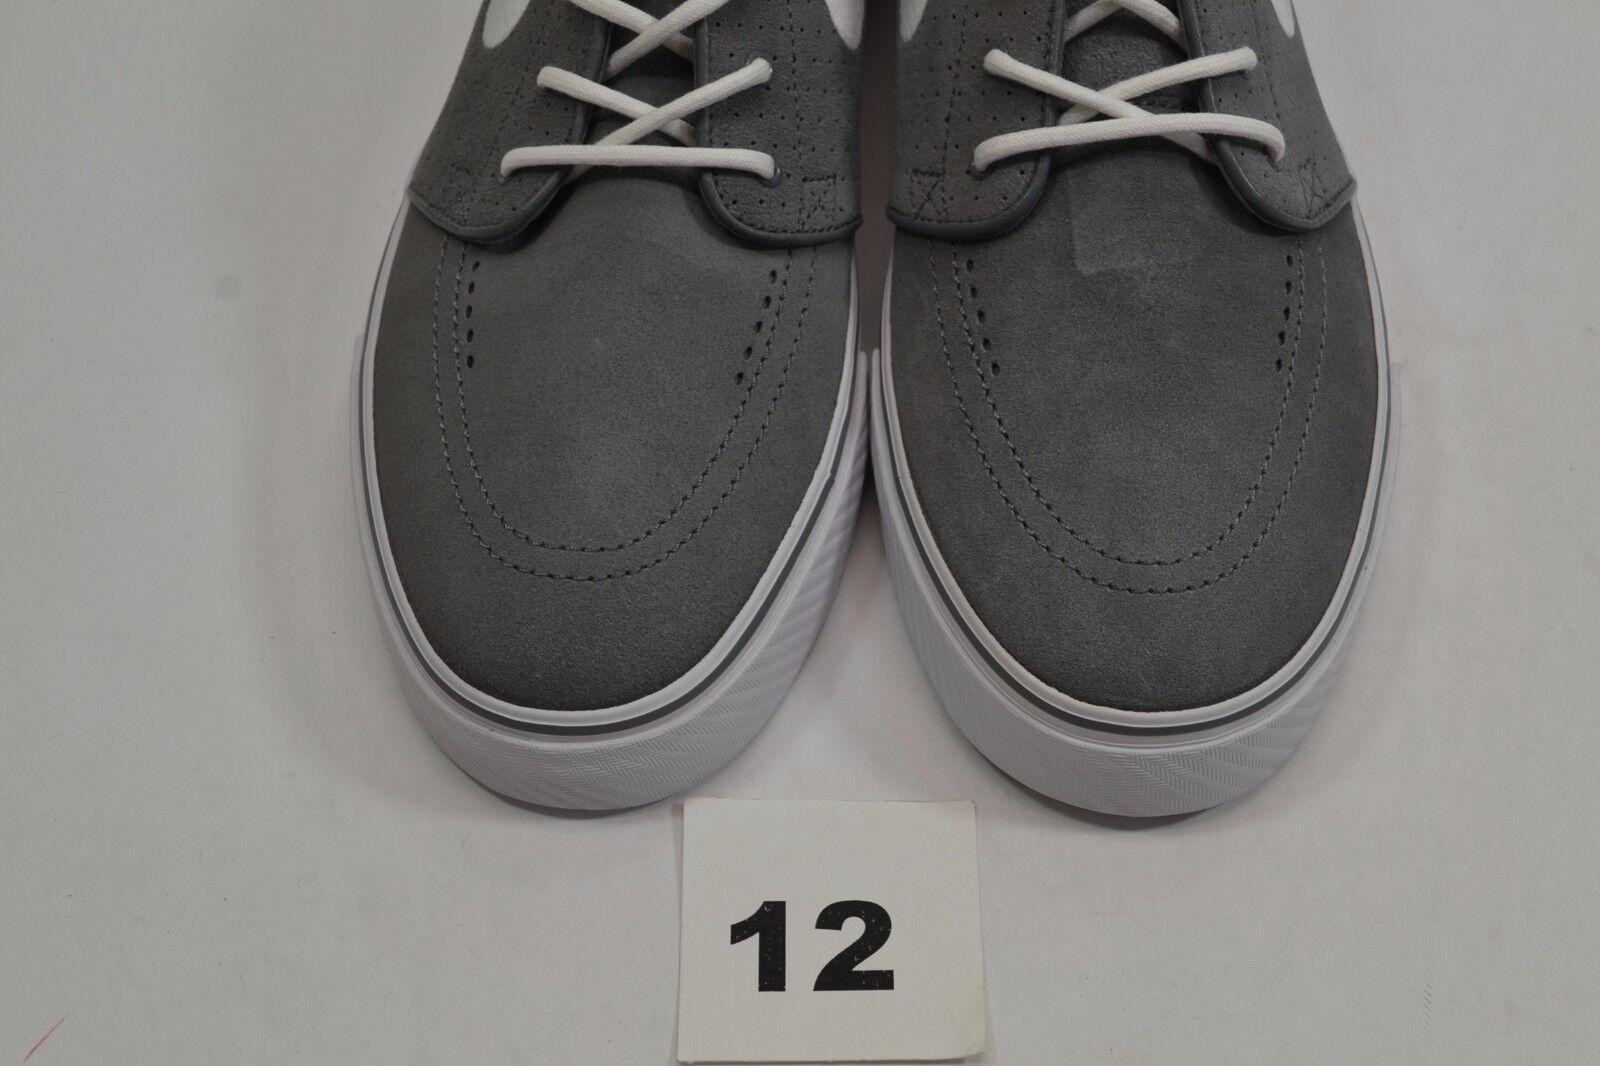 Nike ZOOM STEFAN JANOSKI Cool Grey Grey Grey White Gum  Discounted (293) Men's shoes 134b89